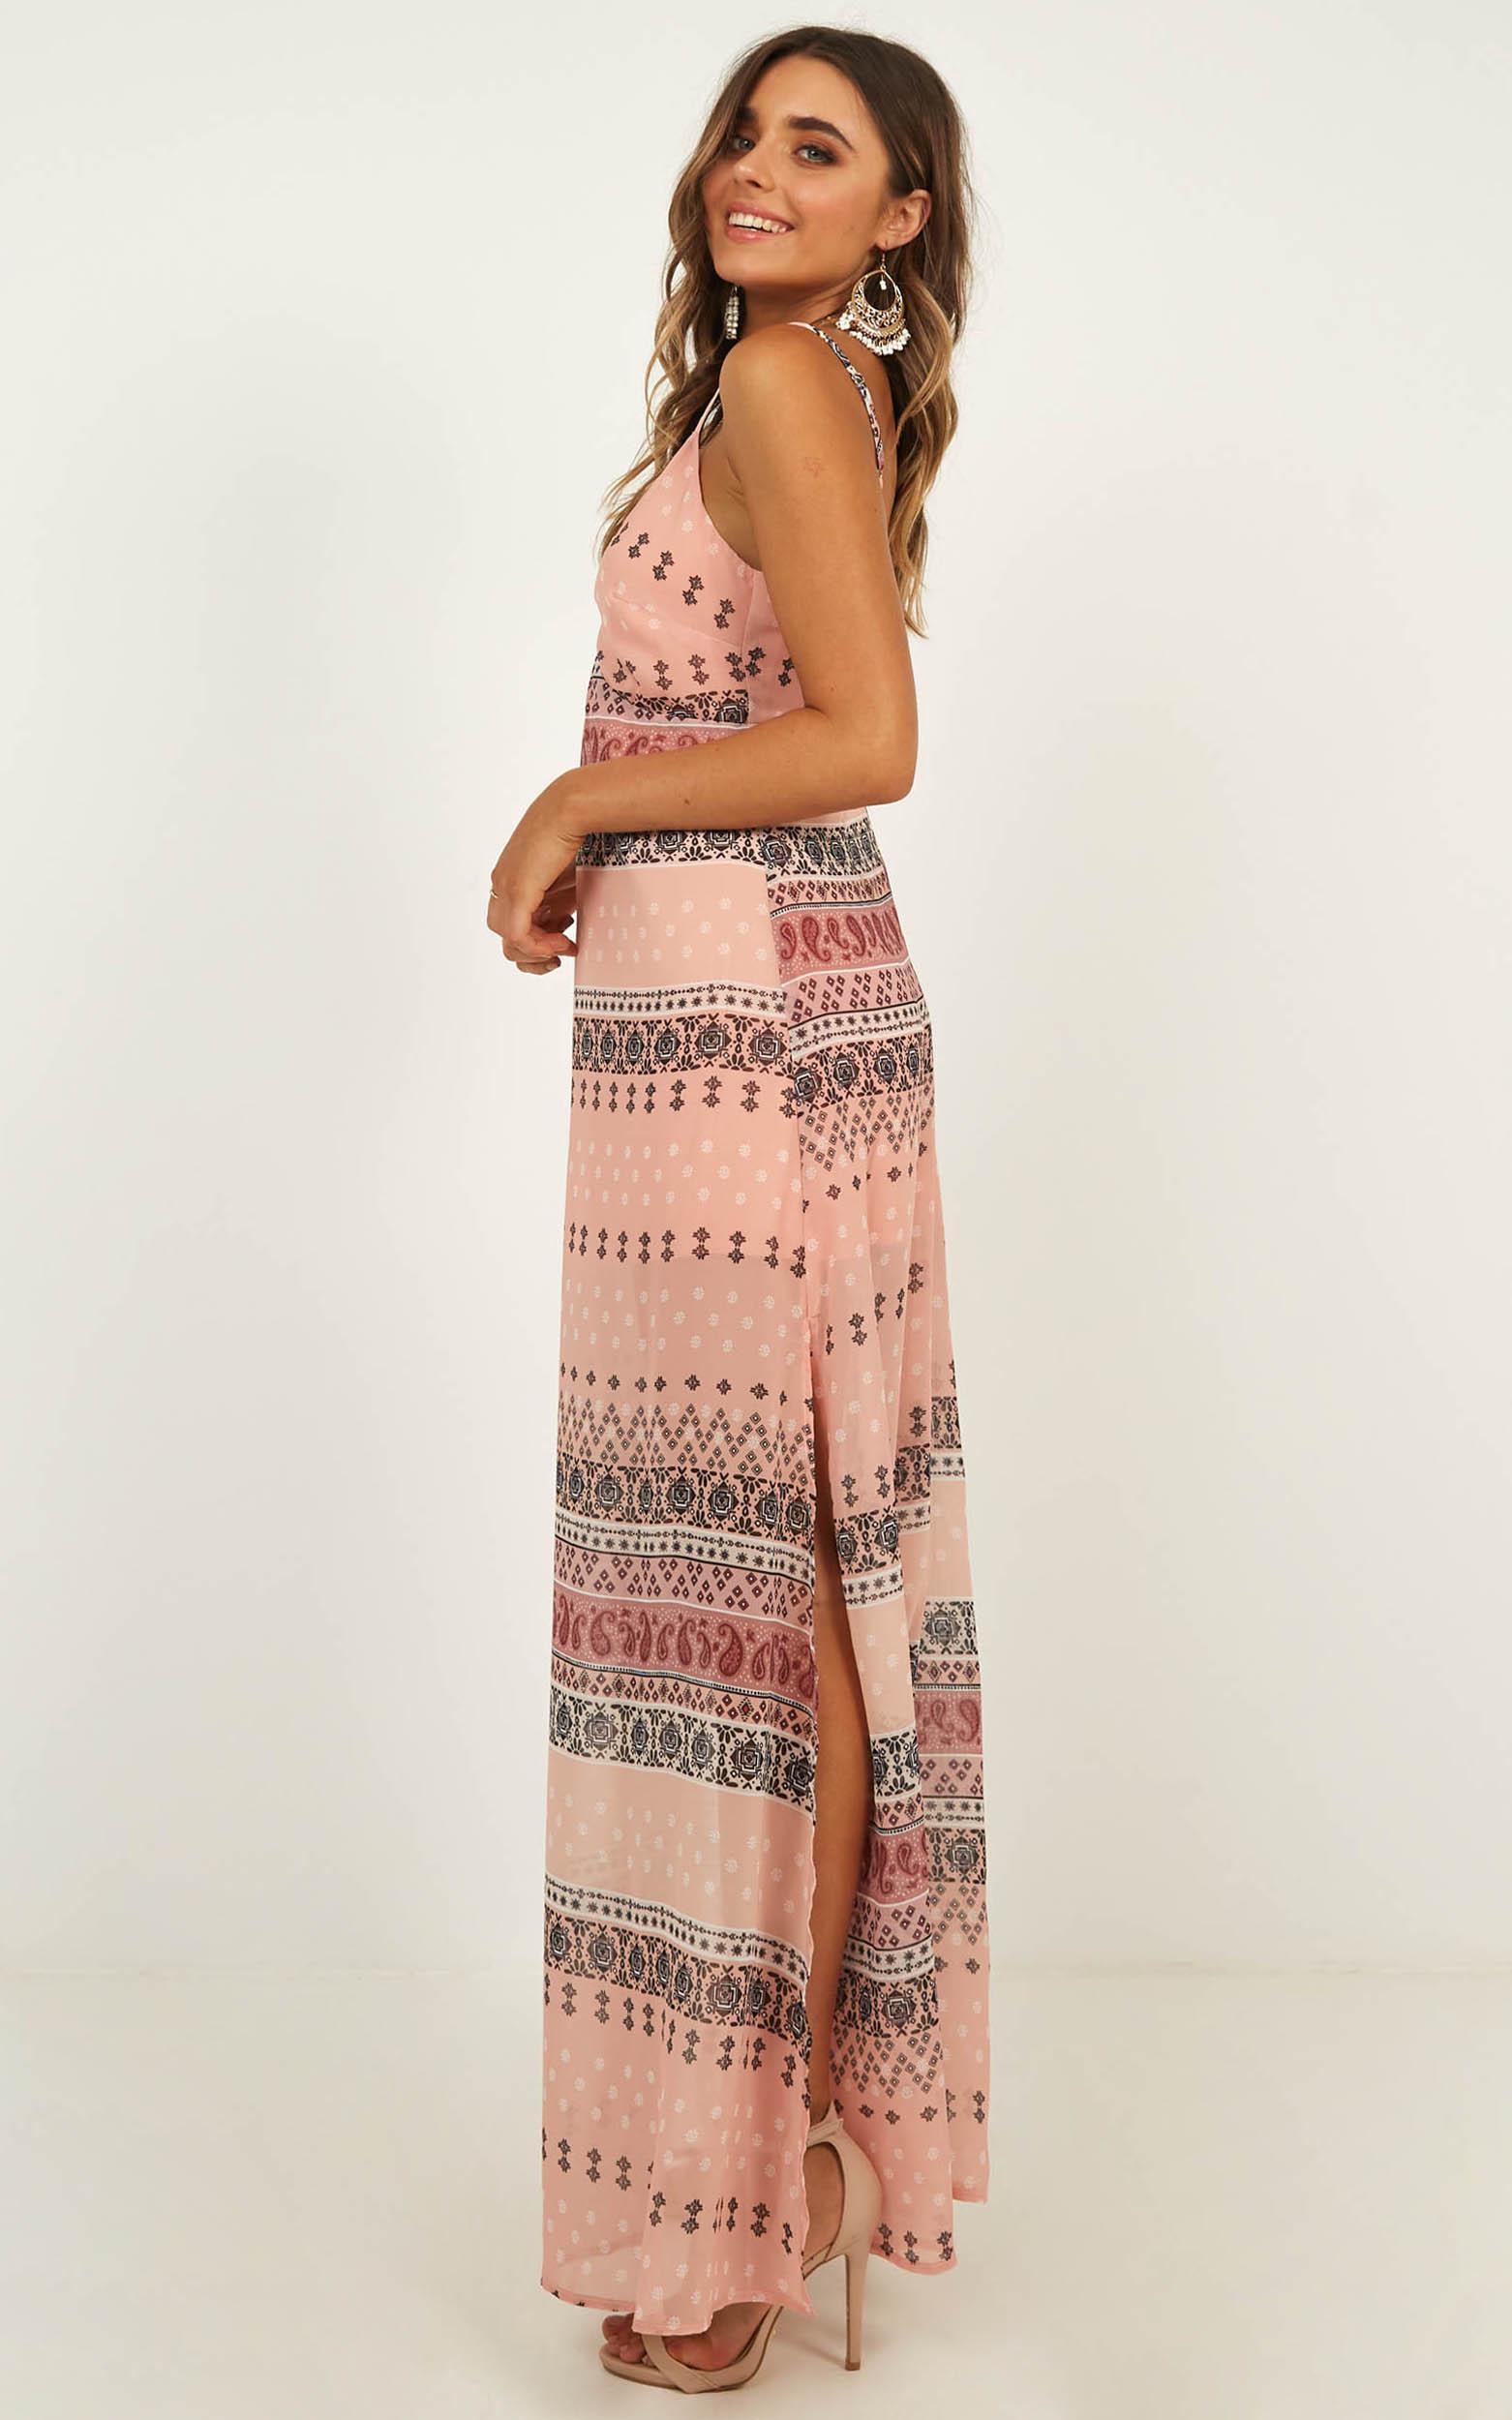 Careless Fun Maxi Dress in boho print - 12 (L), Beige, hi-res image number null